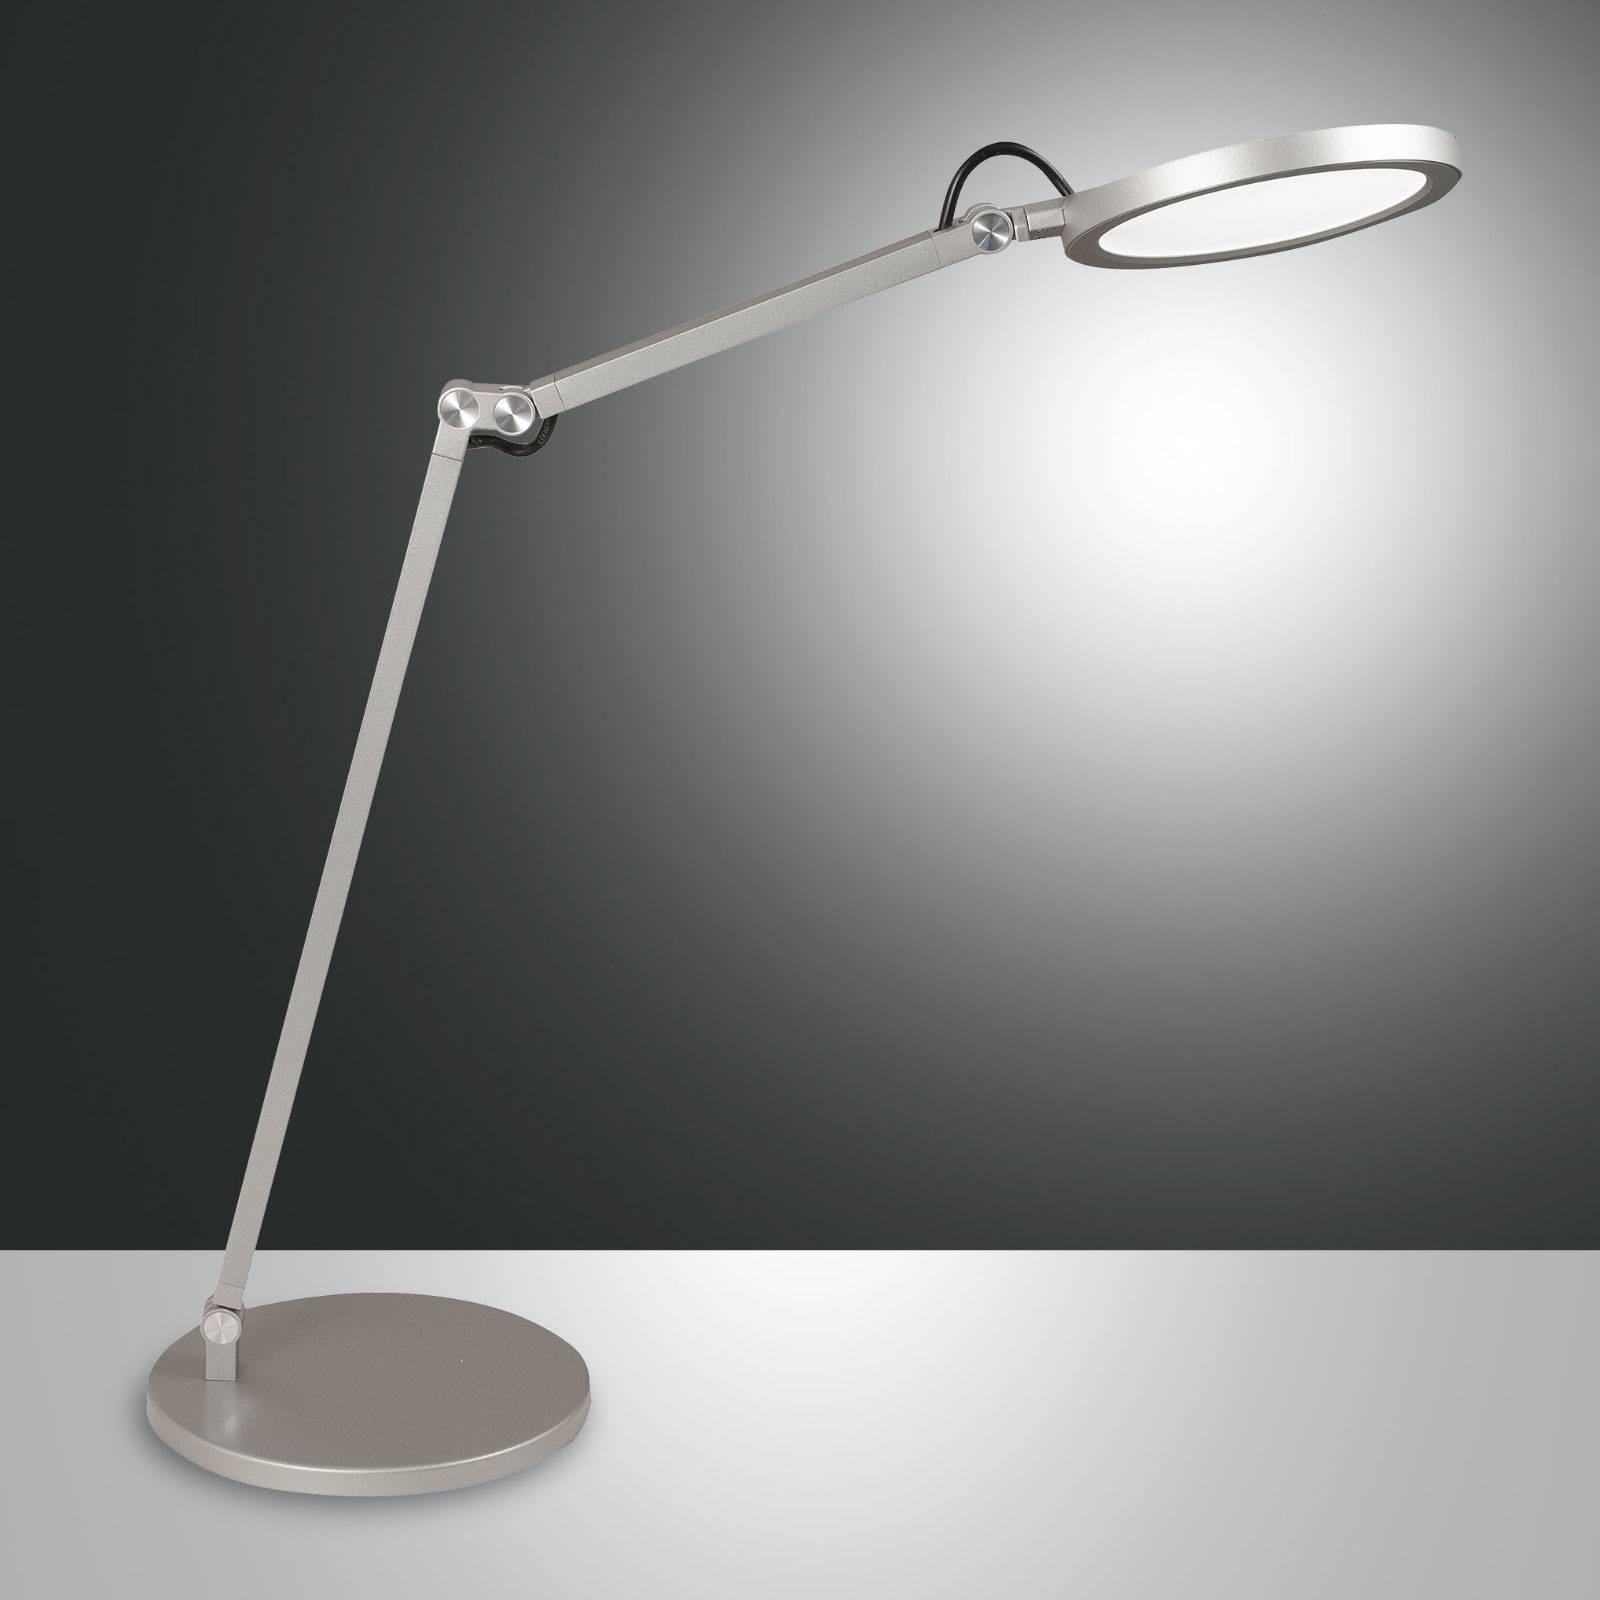 LED bureaulamp Regina met dimmer, alu